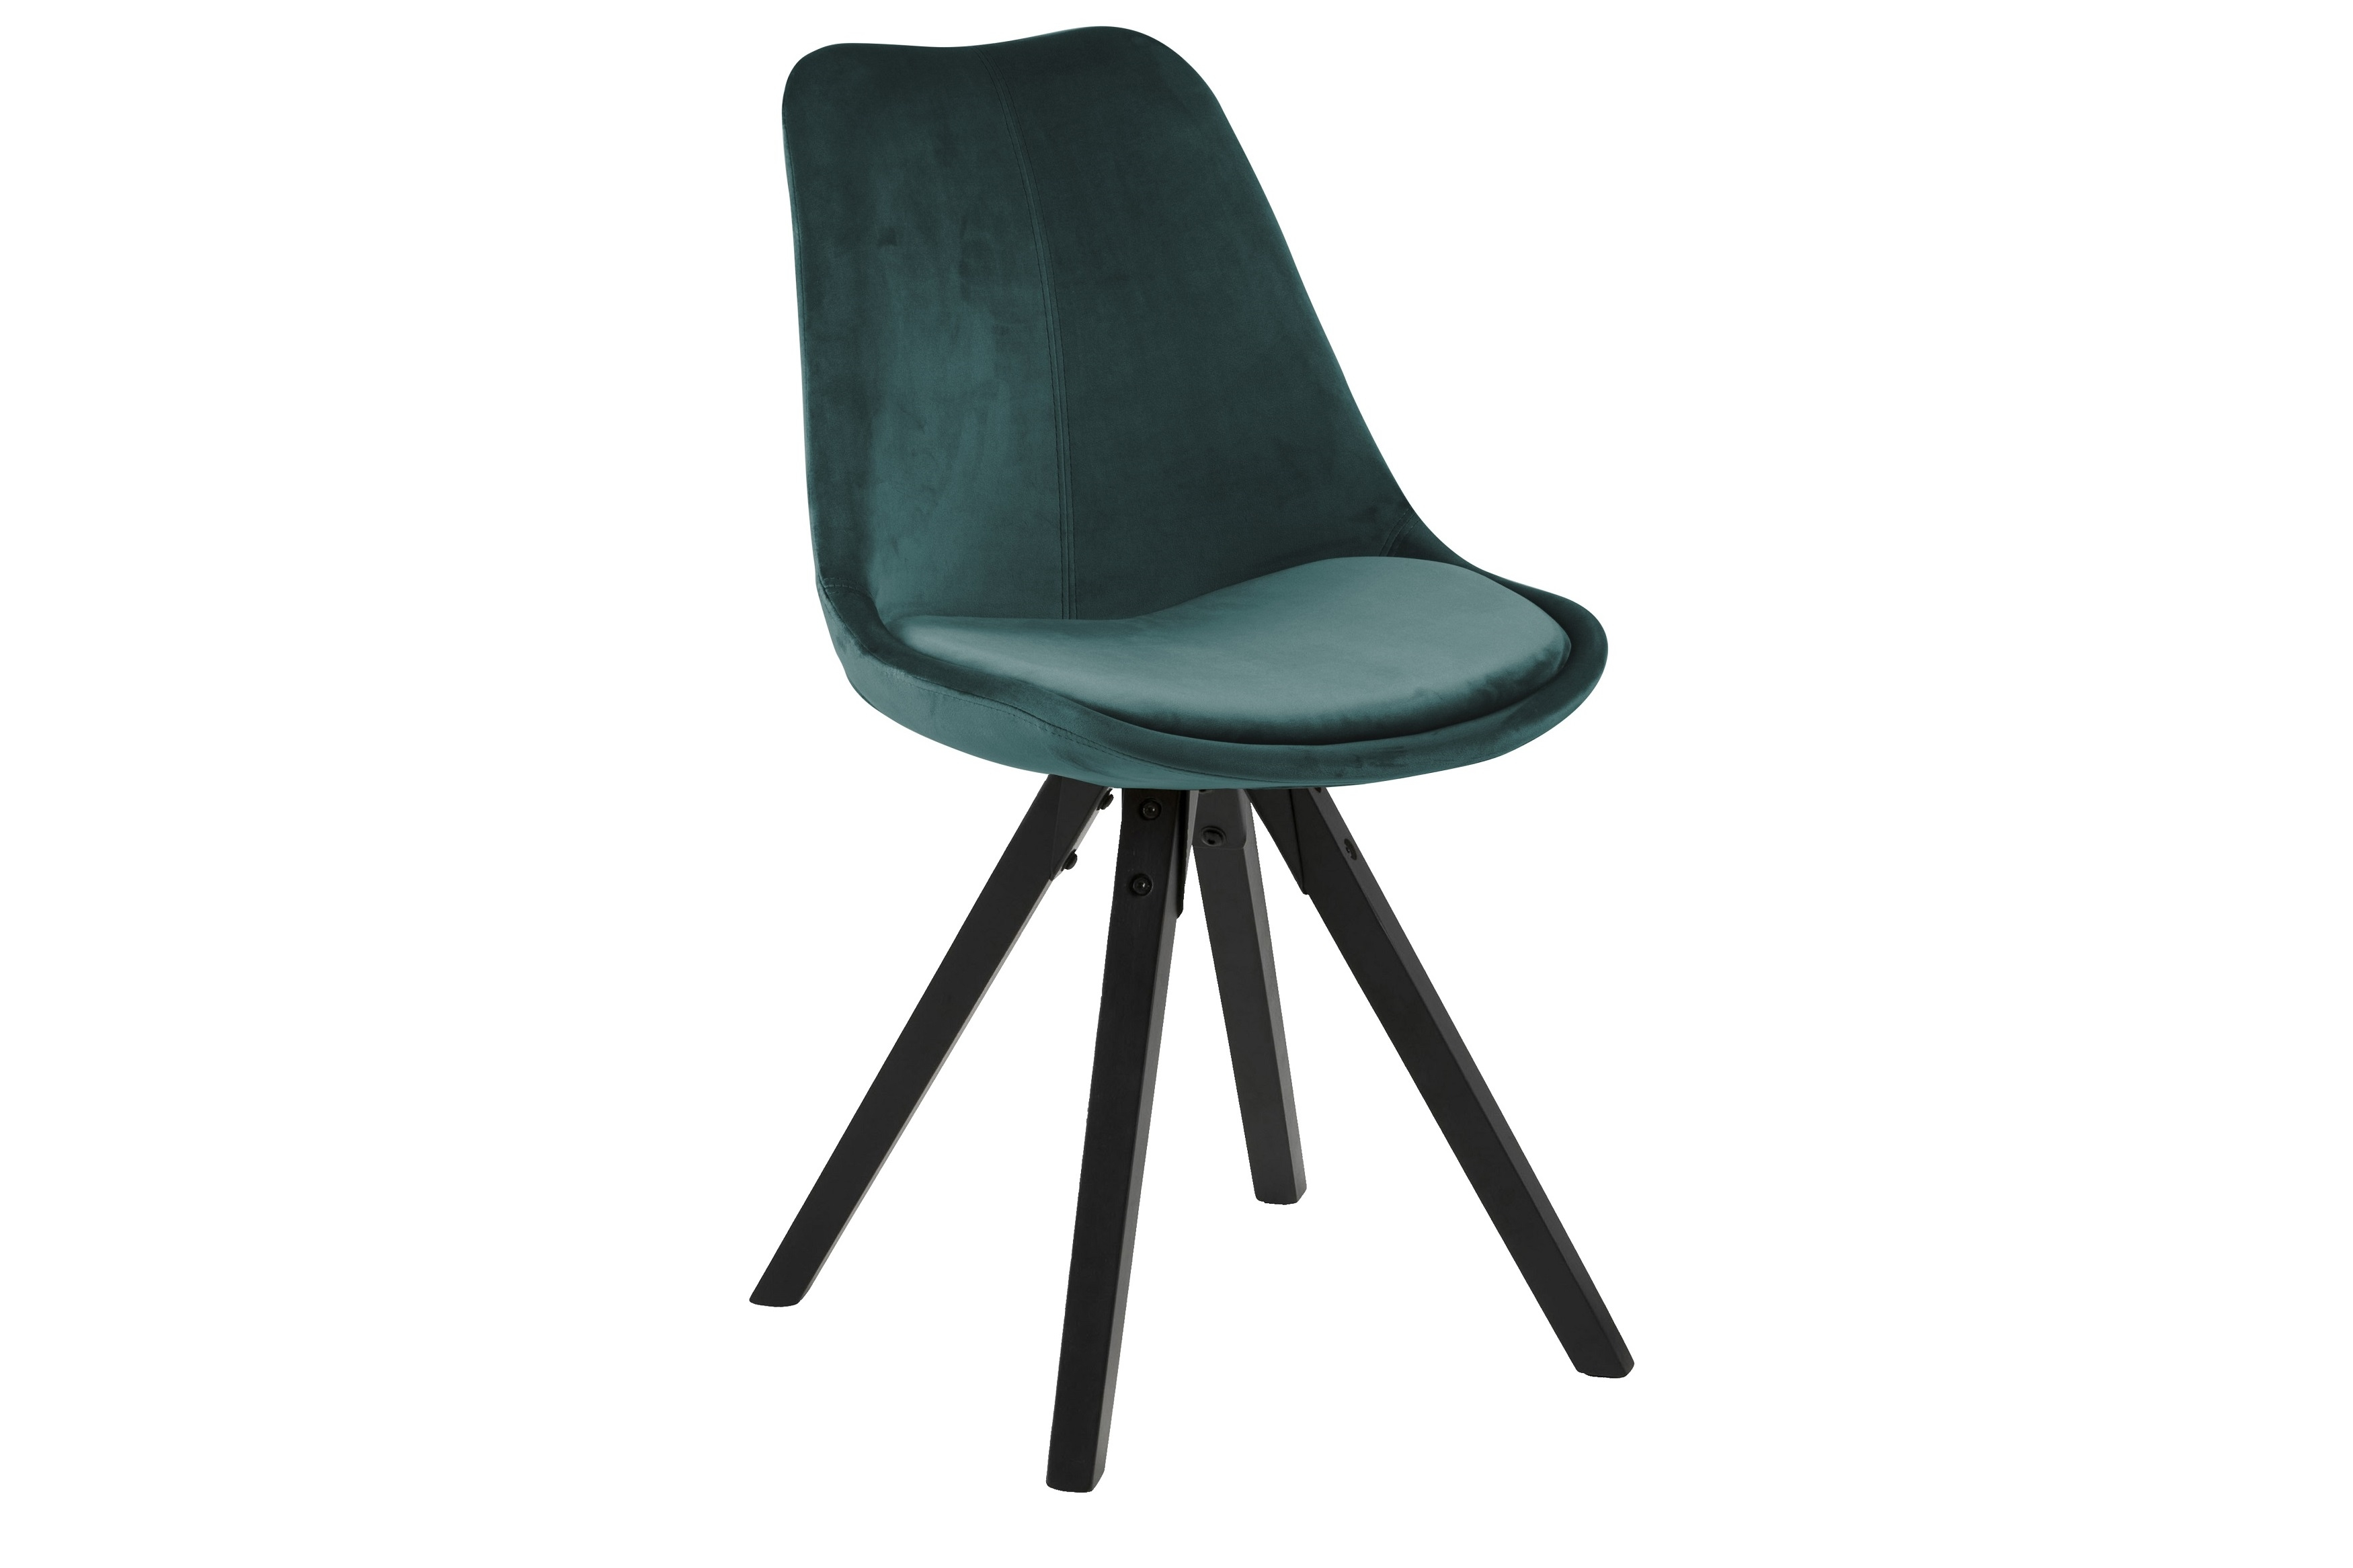 Scaun tapitat cu stofa si picioare din lemn Dima Velvet Verde Inchis / Negru, l48,5xA55xH85 cm